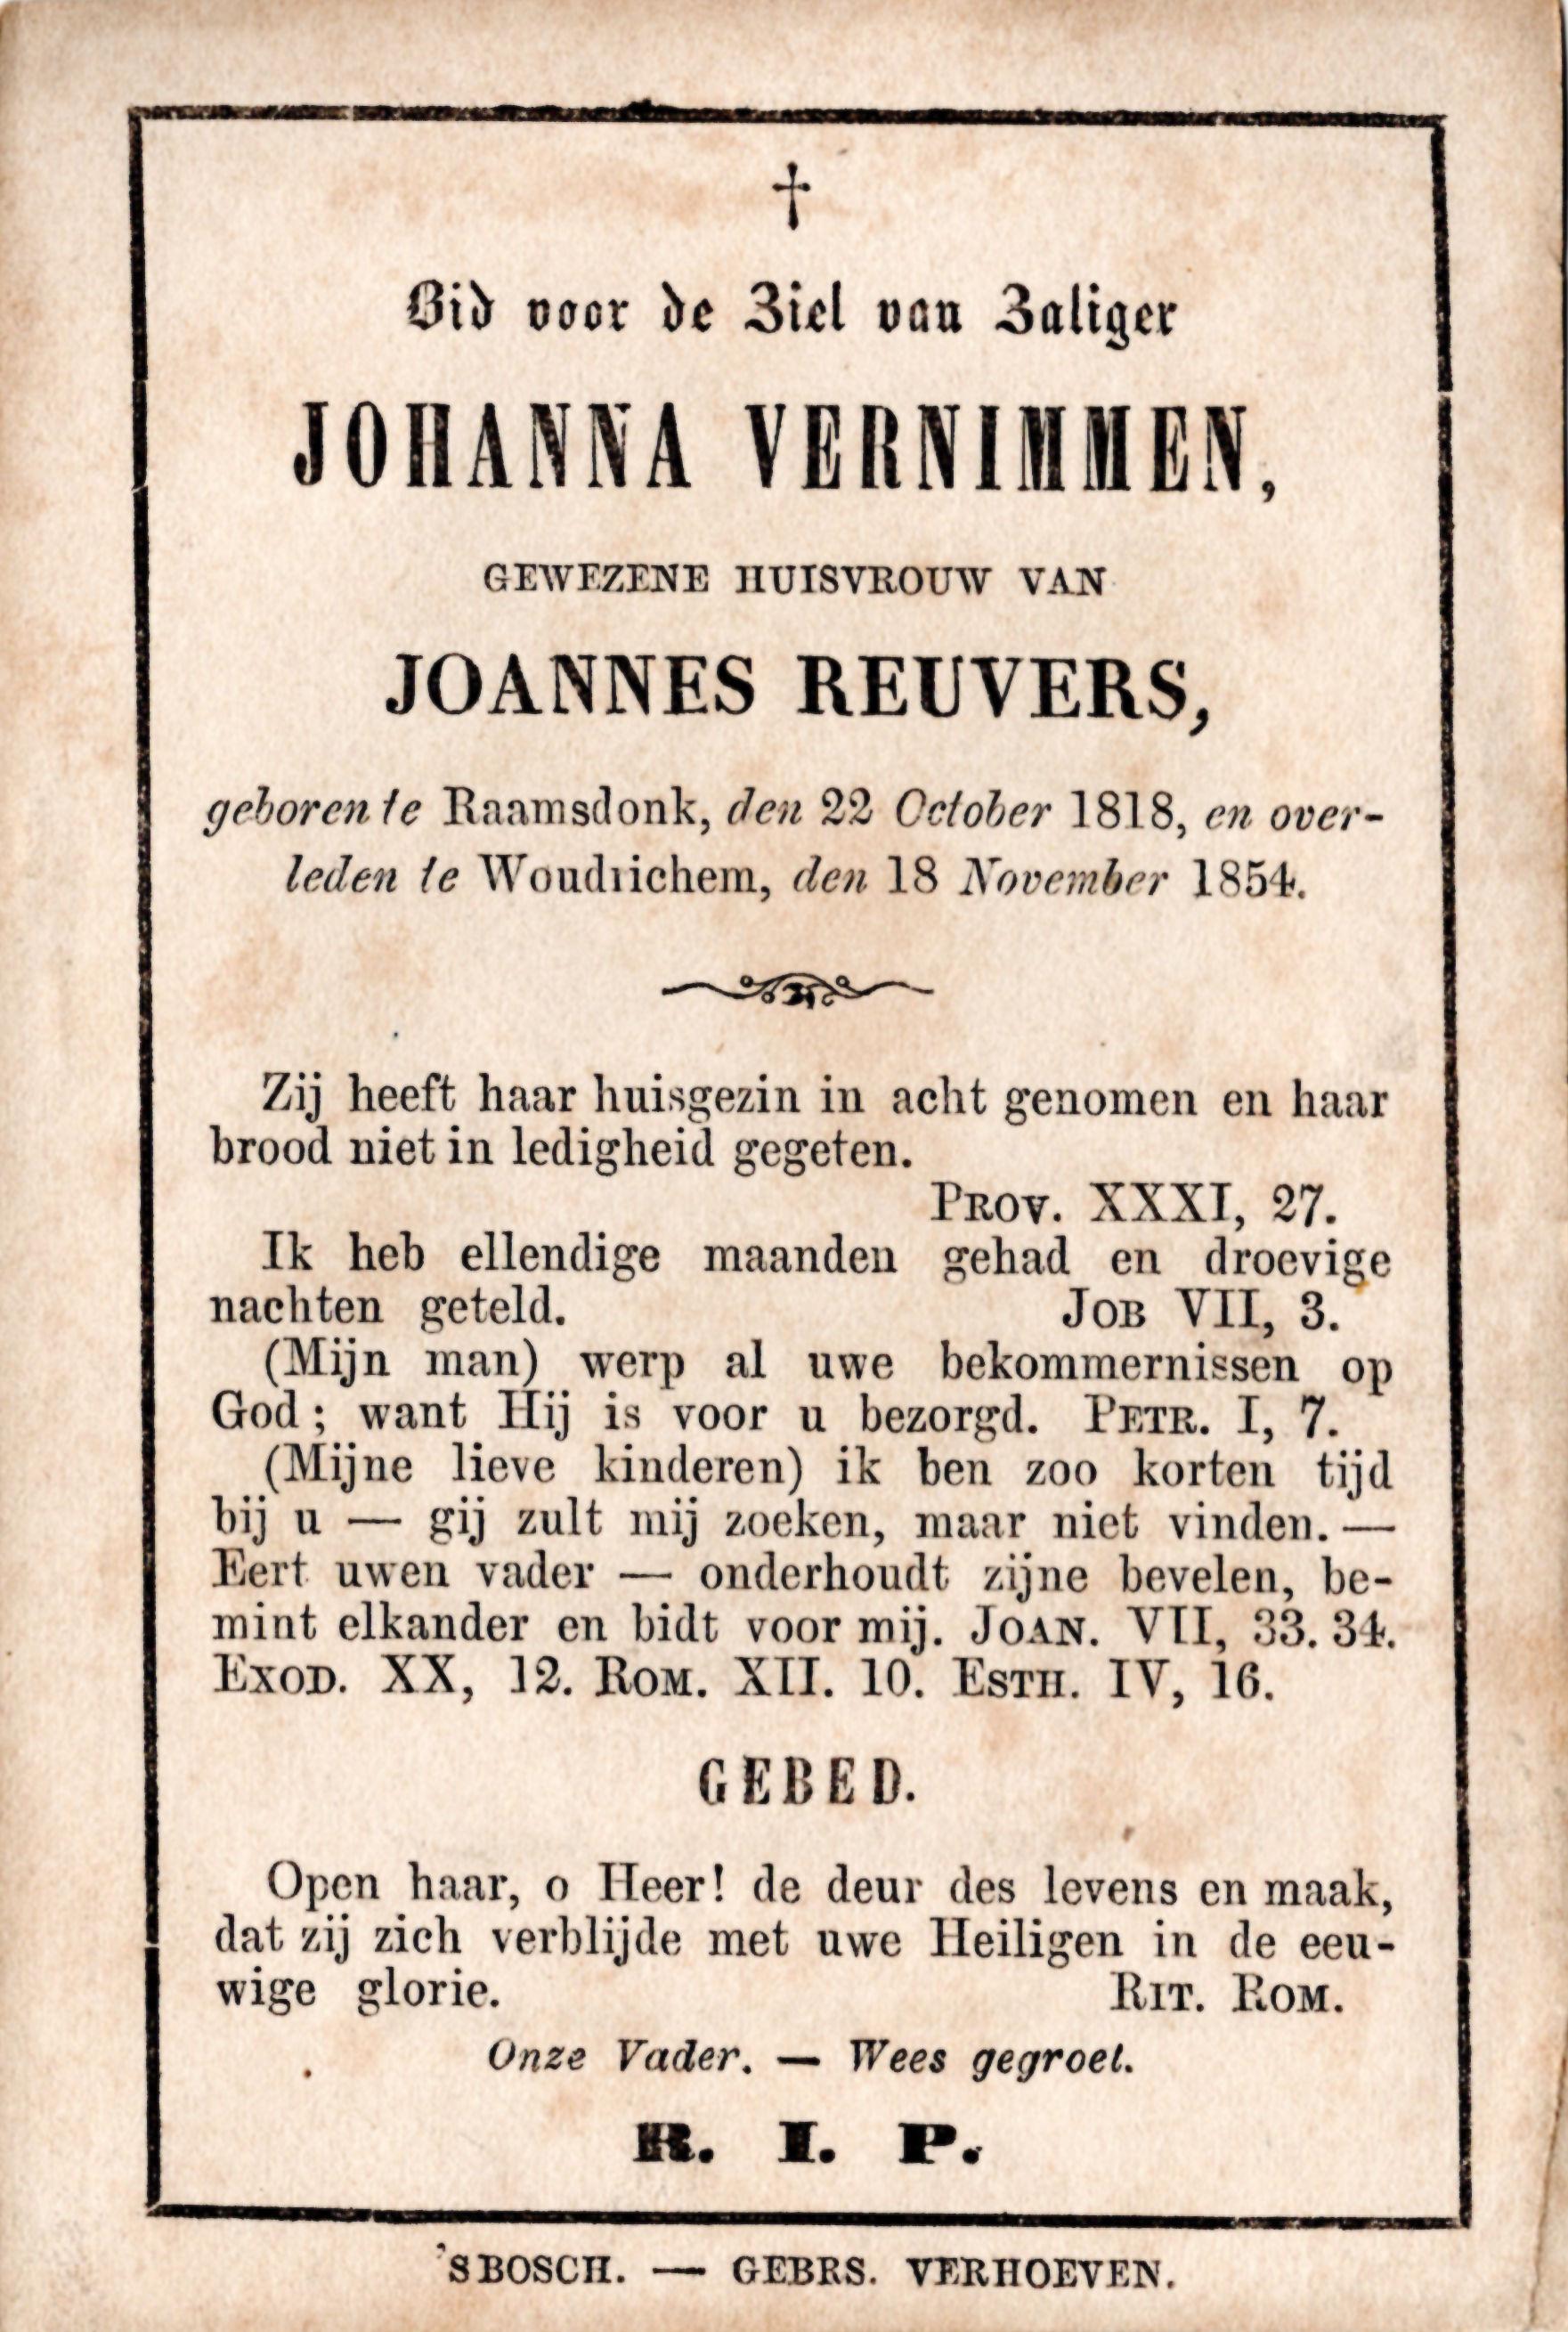 BIDP-027b-Johanna-Vernimmen